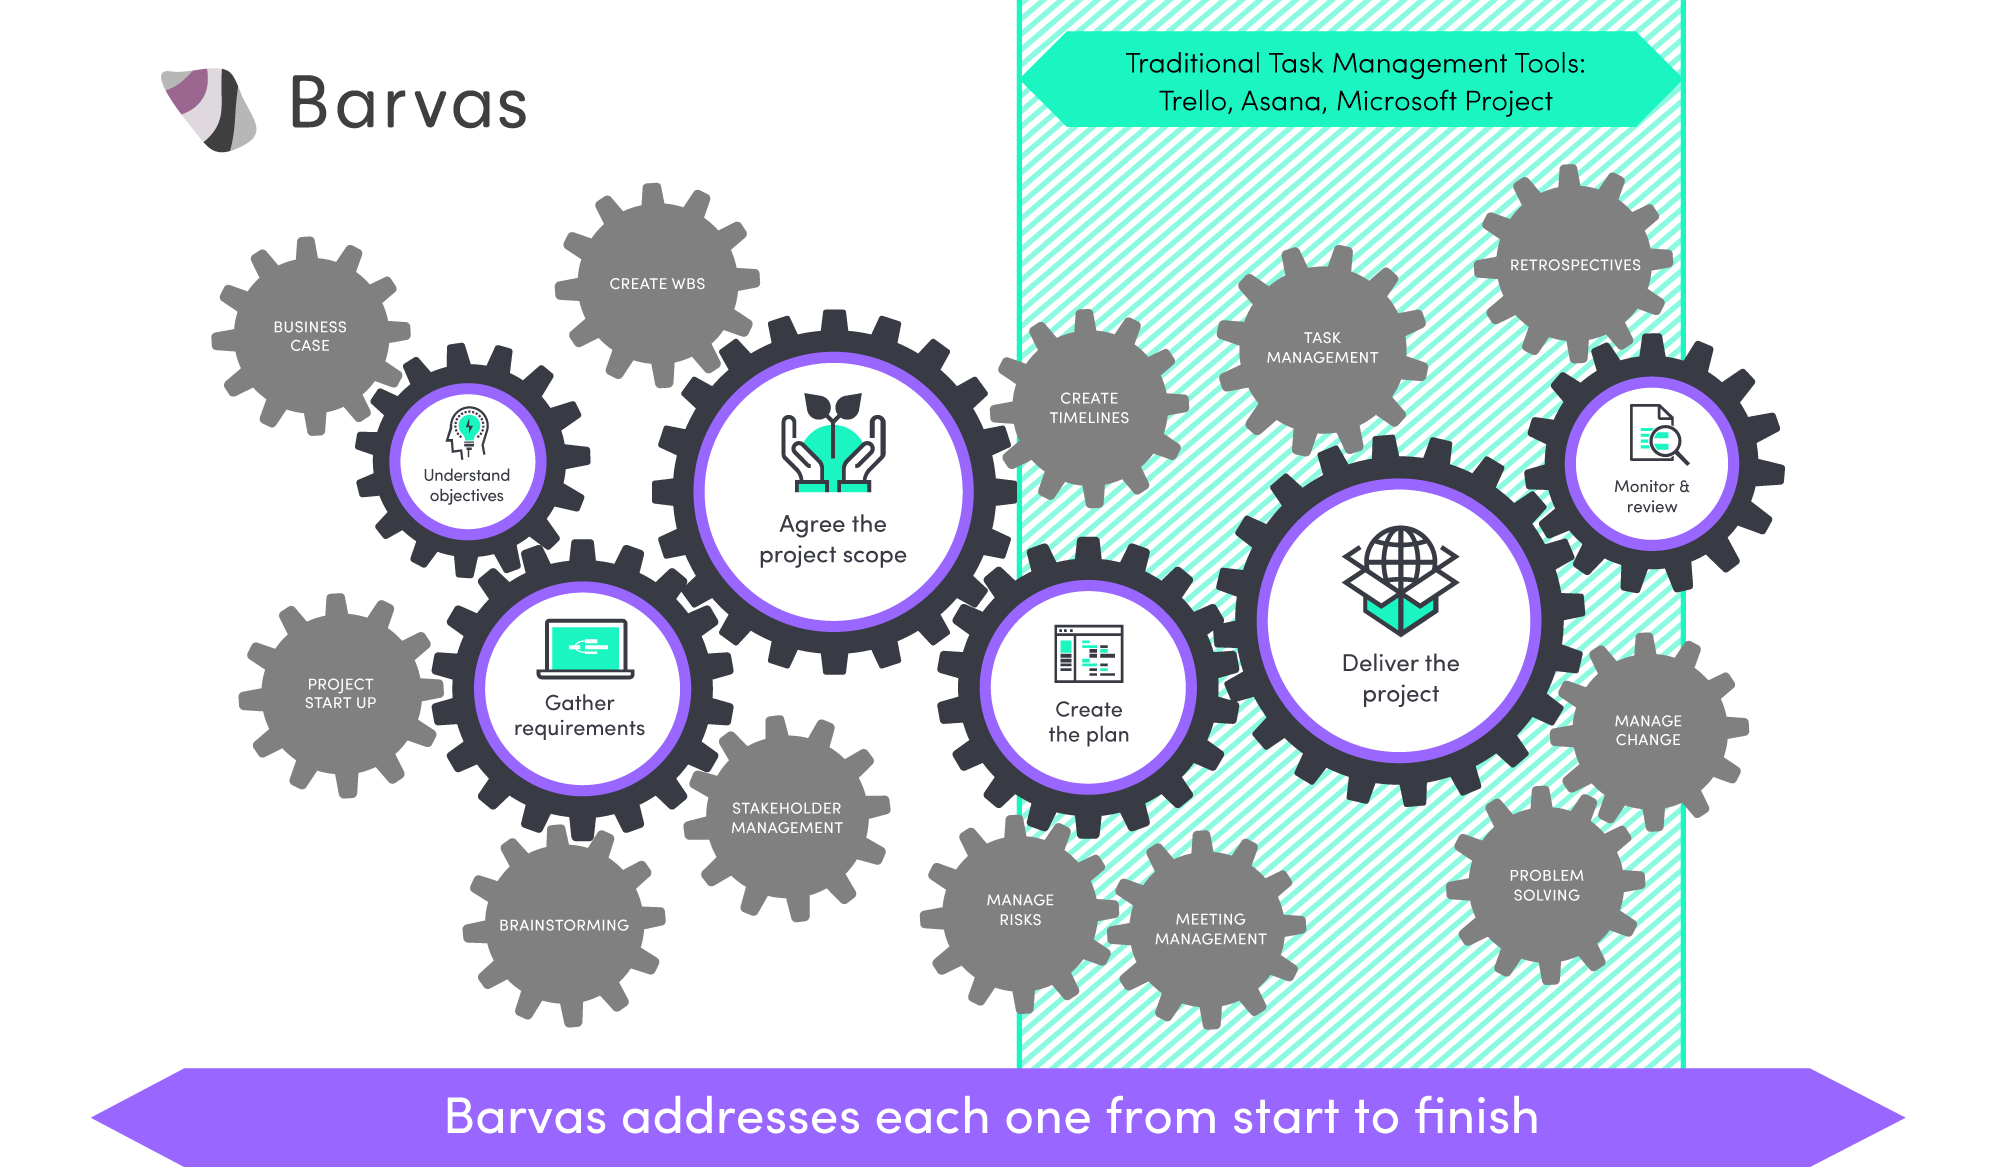 filecogs baravs 6 steps project management png